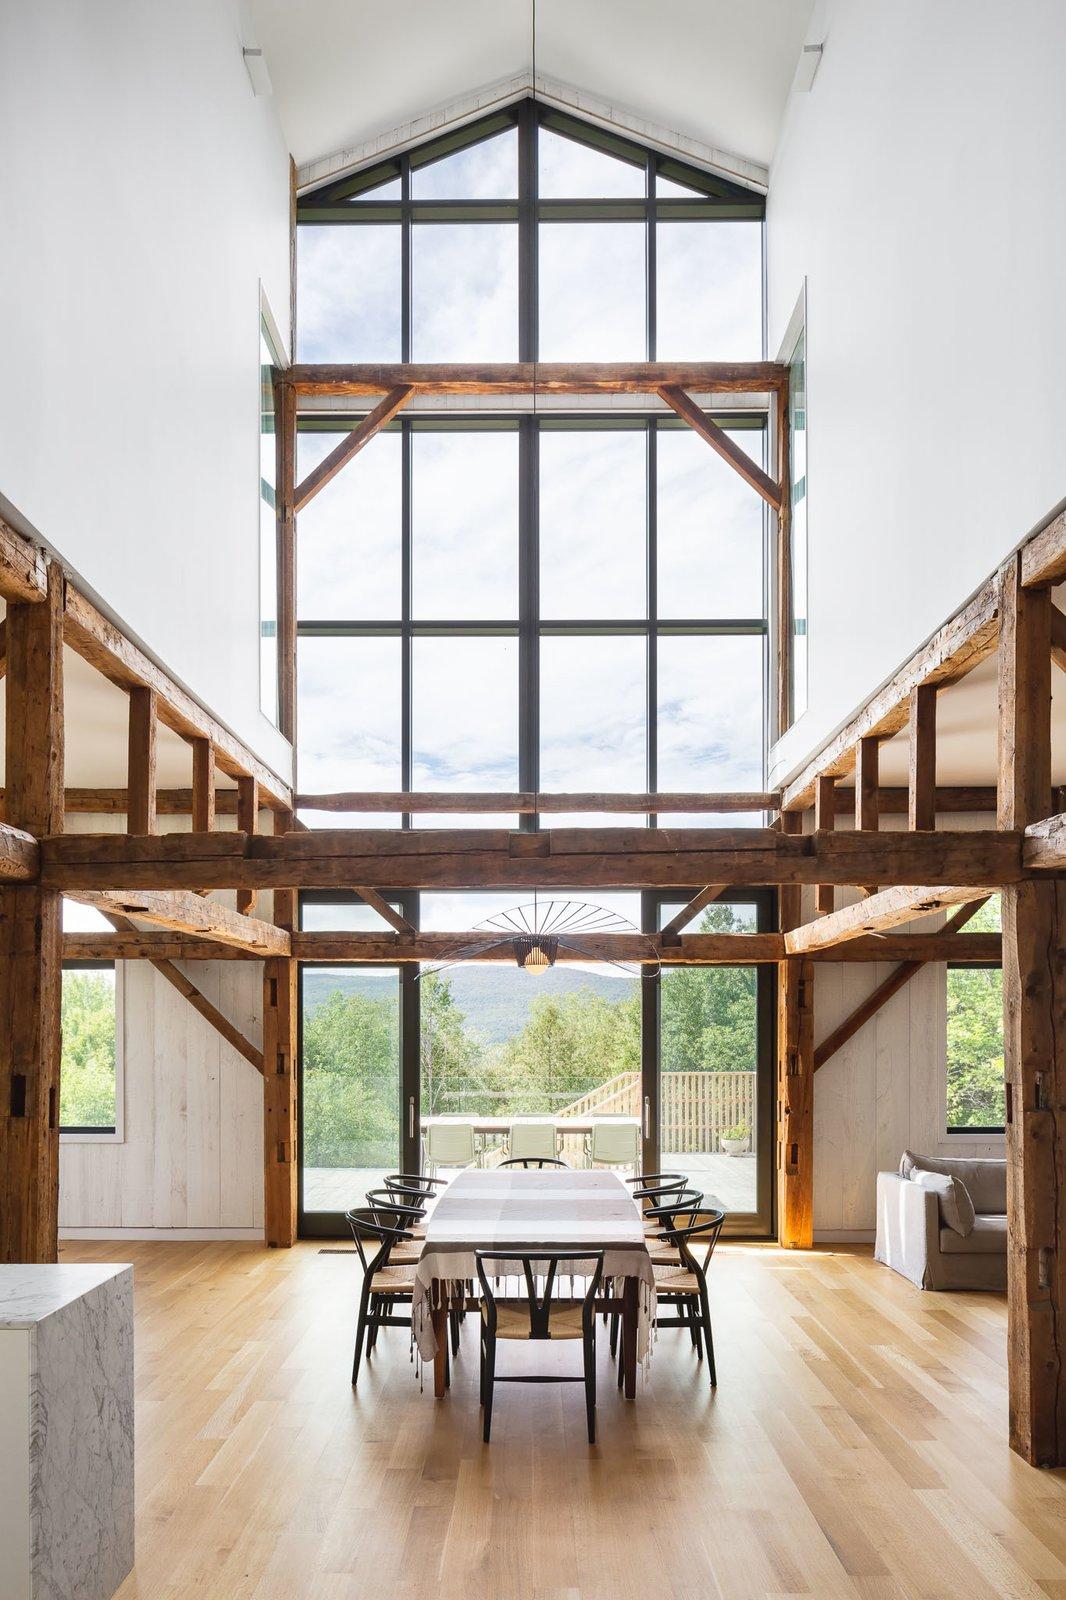 Dining Room, Table, Chair, Pendant Lighting, and Medium Hardwood Floor  Photos from The Barn